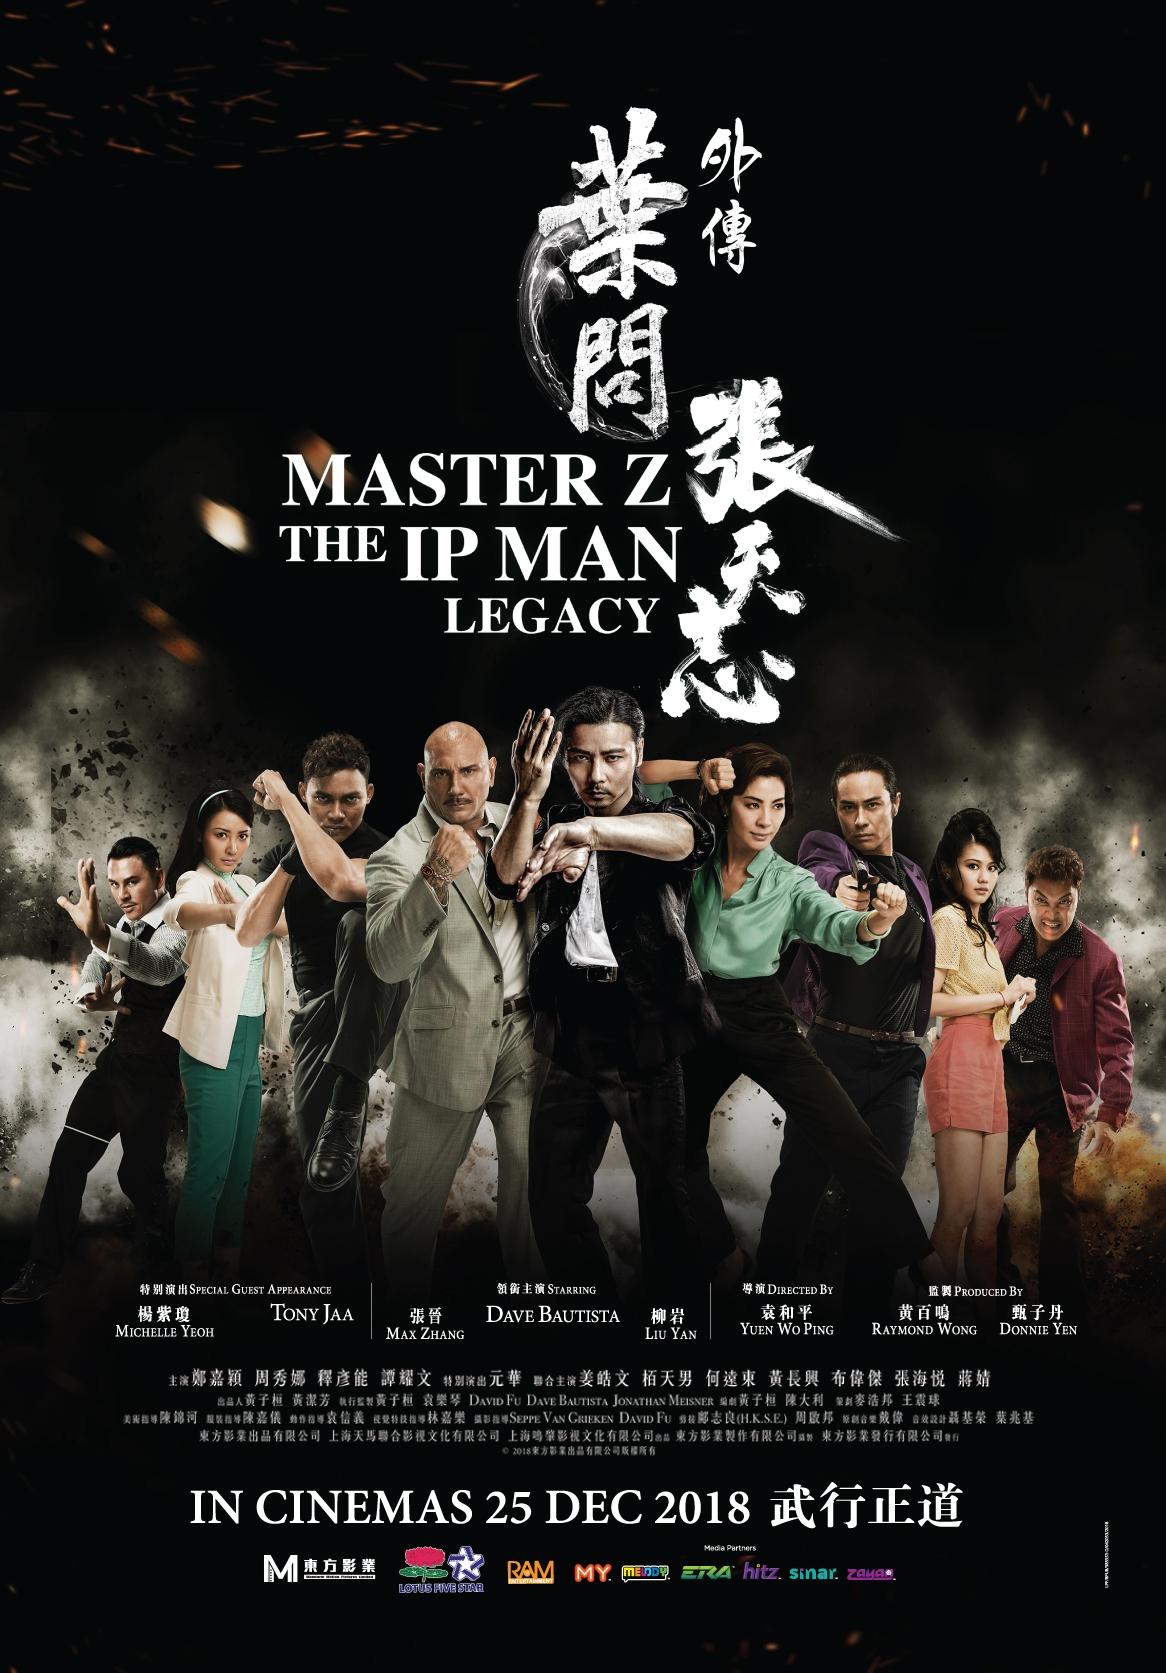 Master Z : The IP Man Legacy <br/> 葉問外傳:張天志 <br/> 25 December 2018